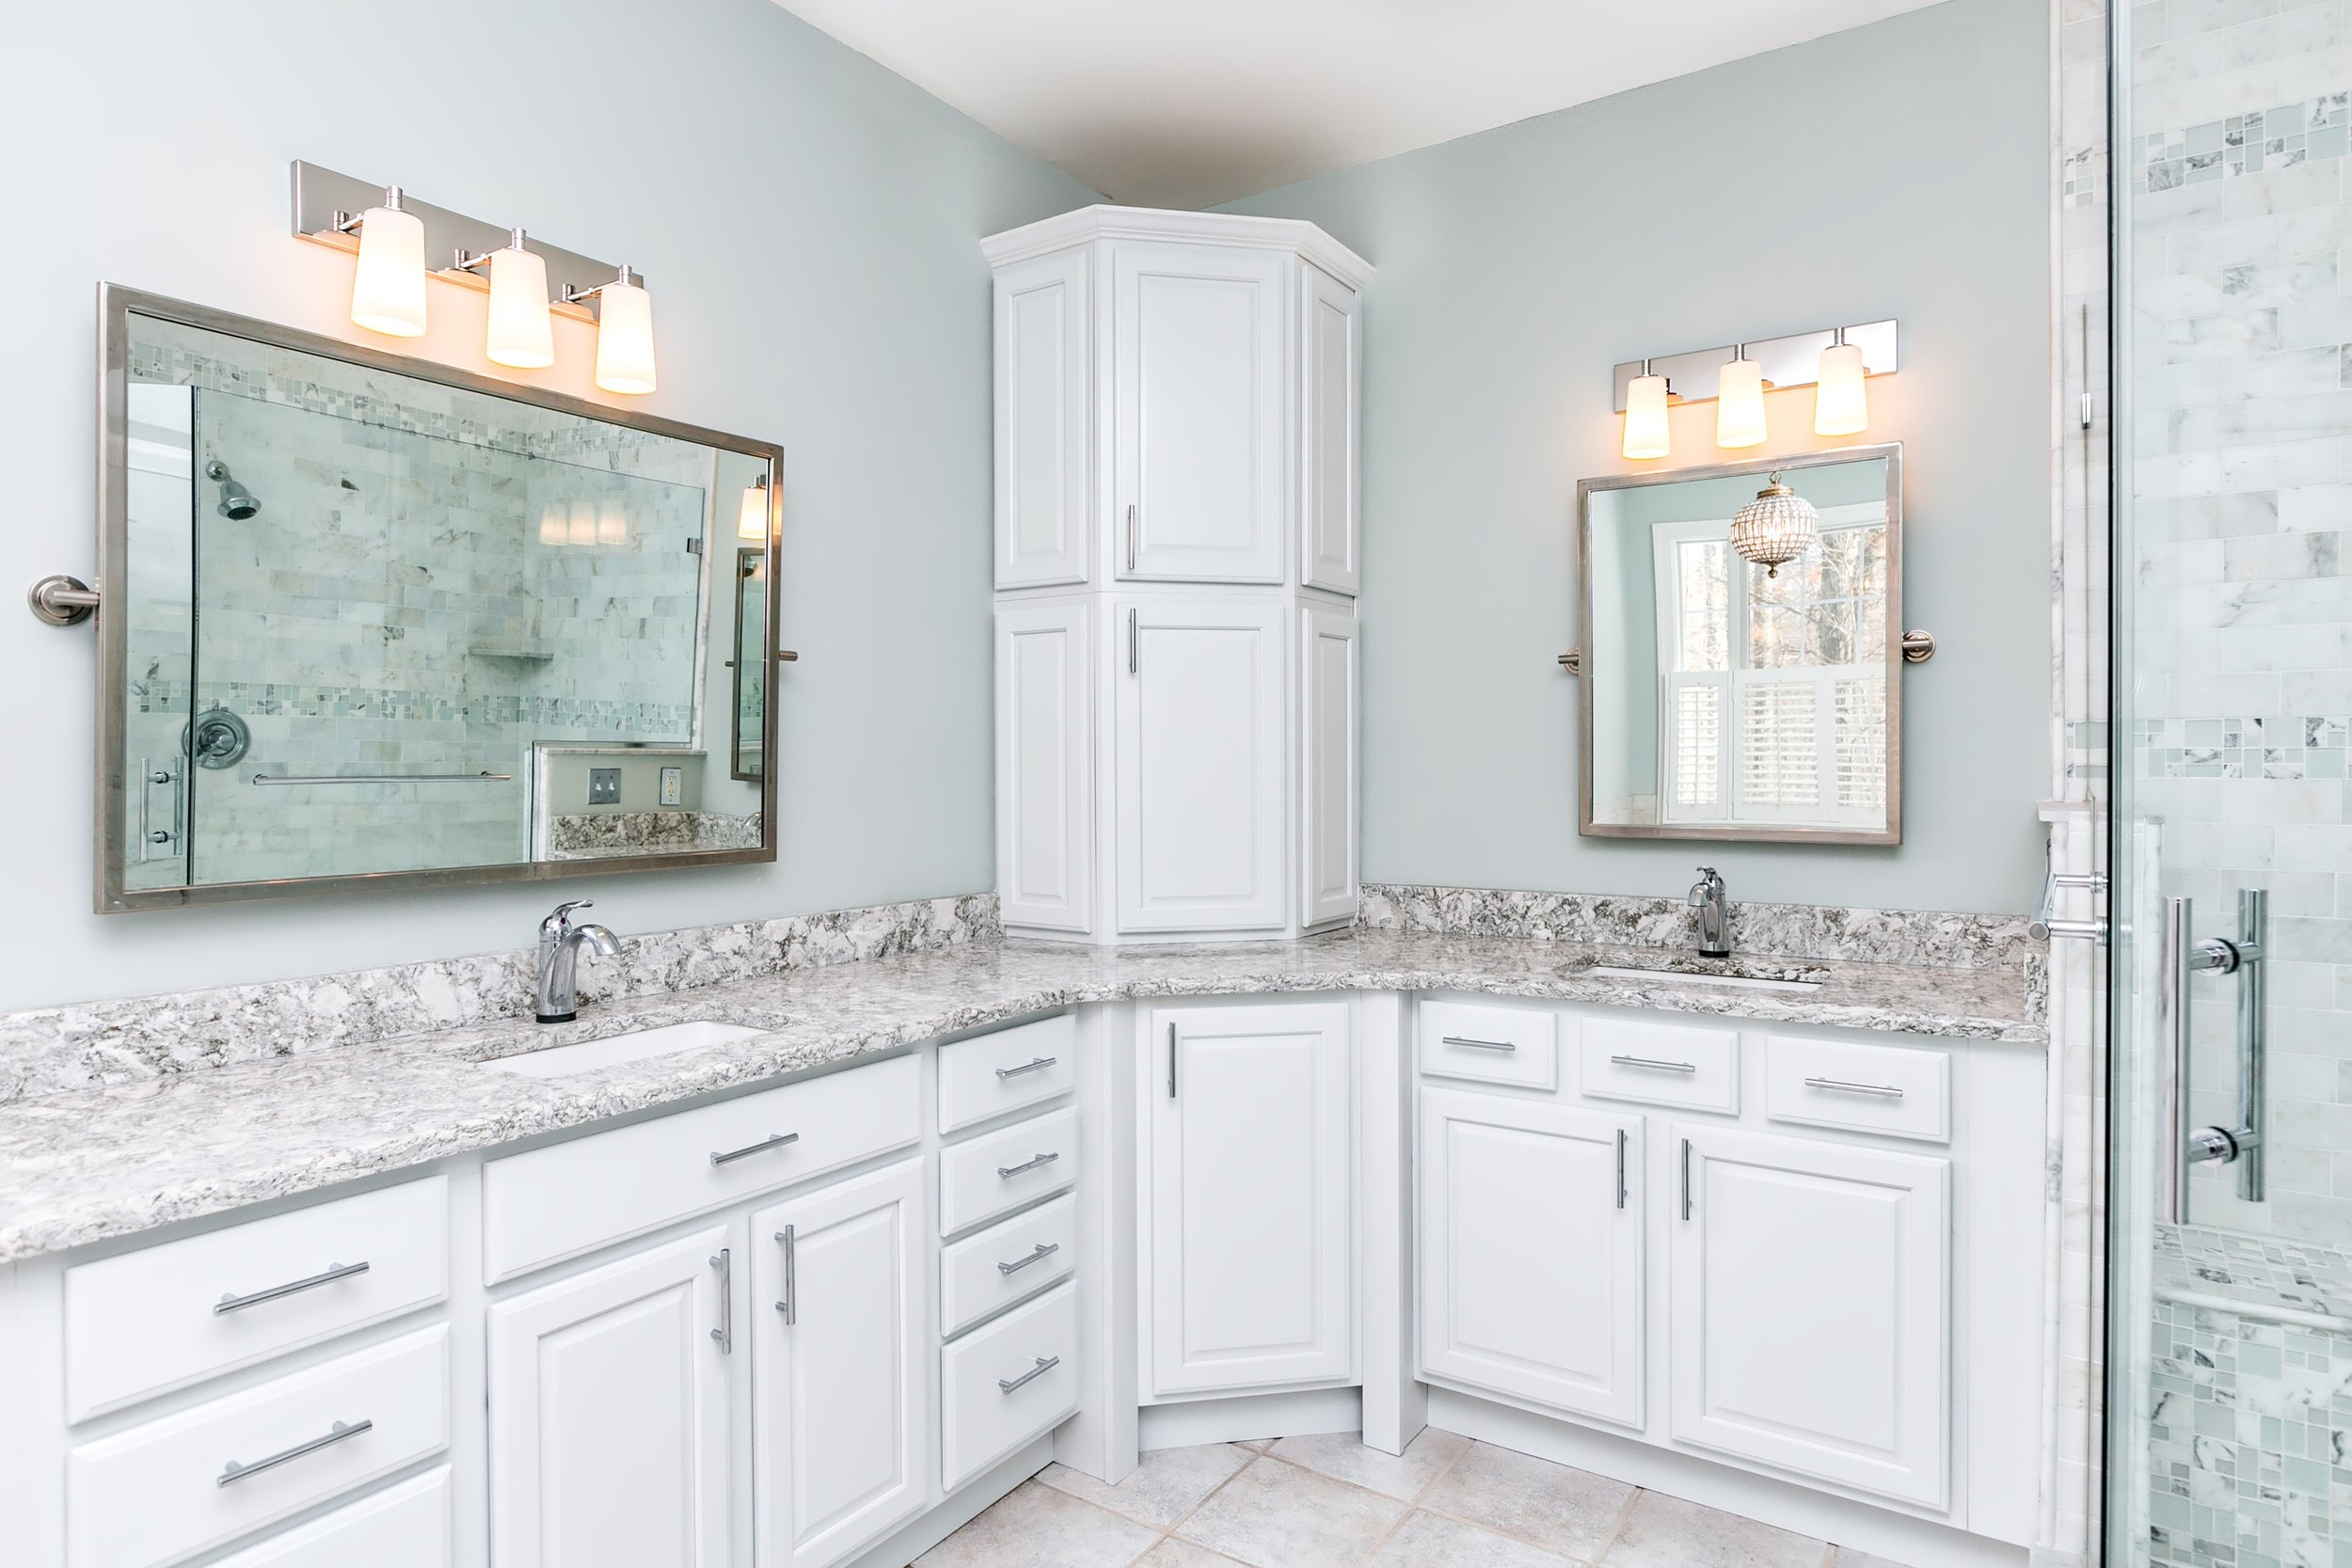 38_Master Bathroom_HDR.jpeg